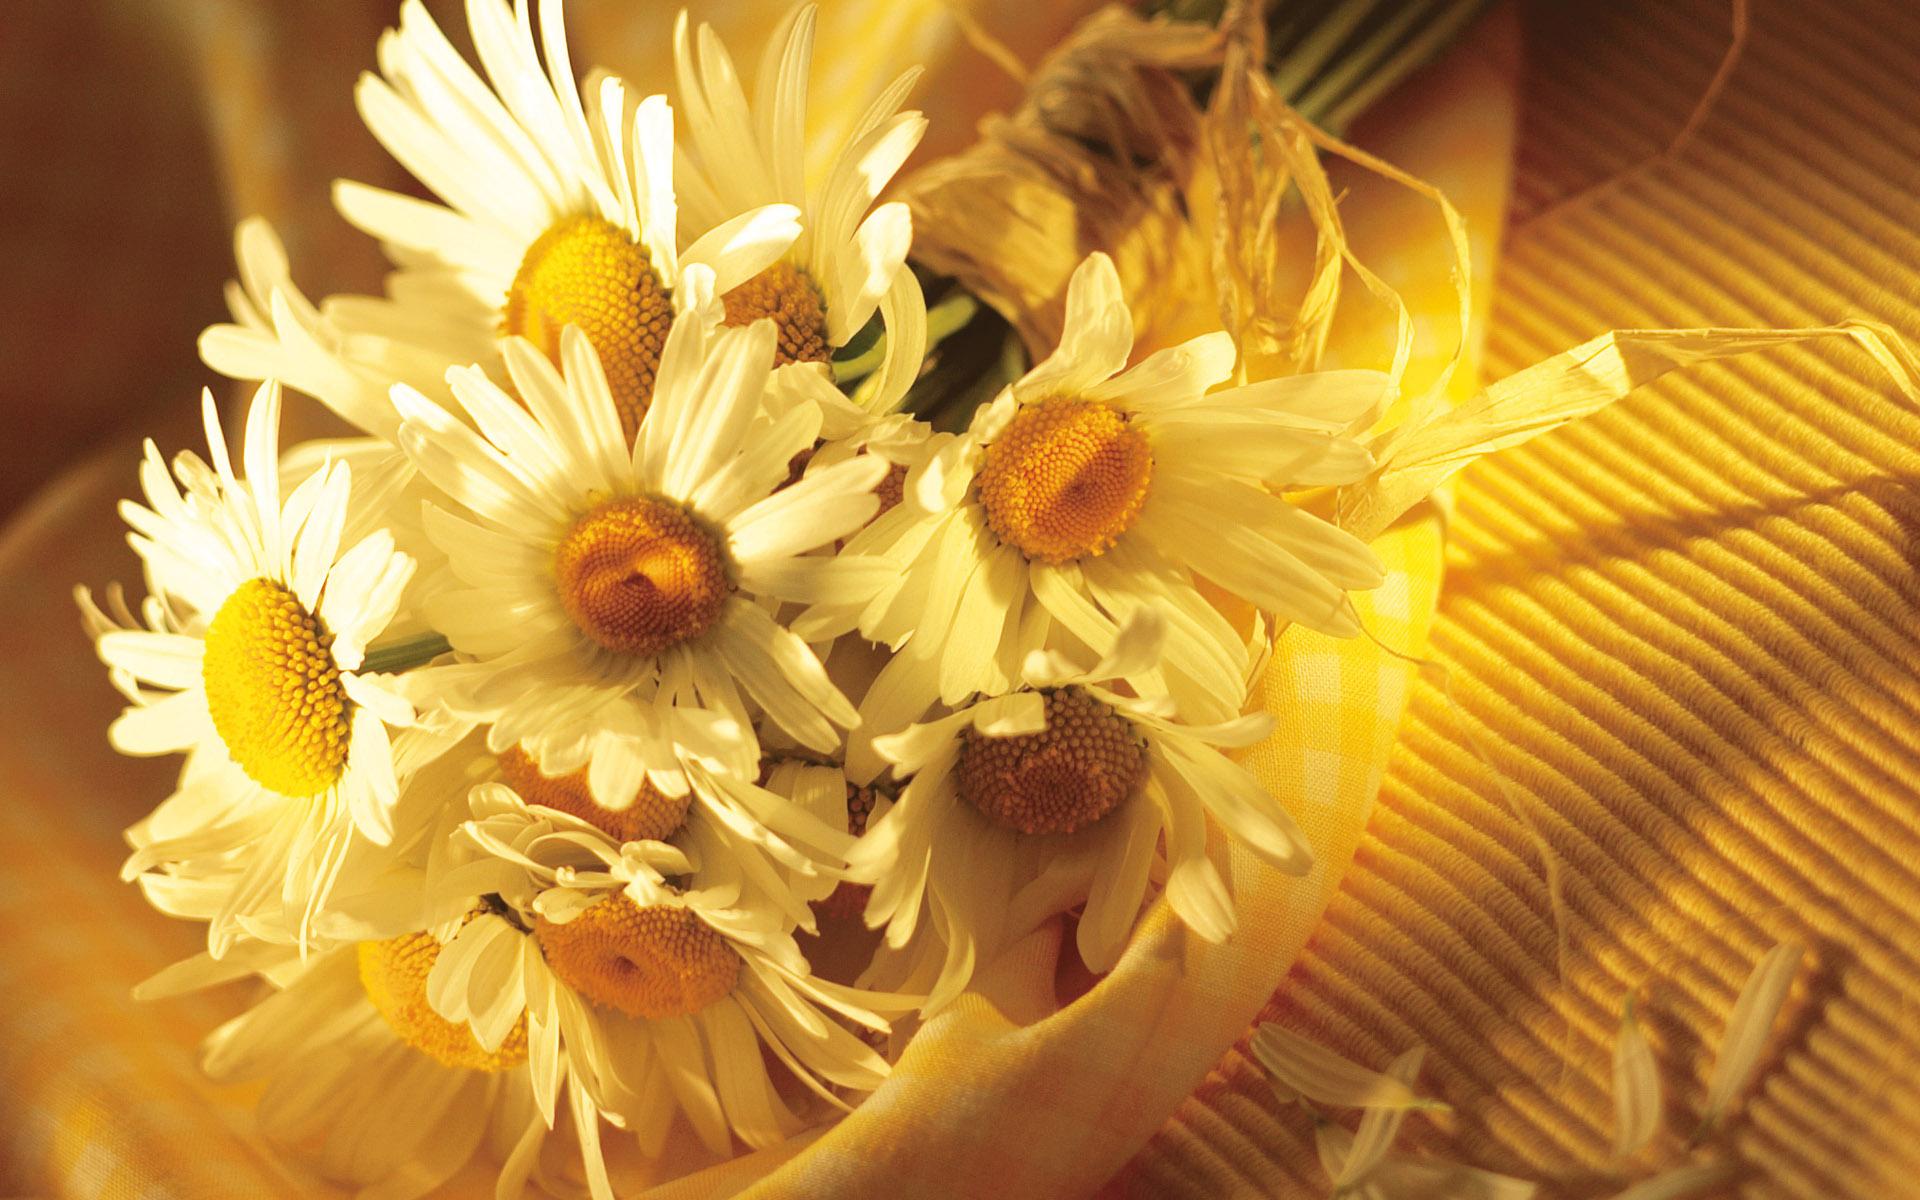 Shasta daisies aprils birth flower of the month auntie dogmas bouquet of daises izmirmasajfo